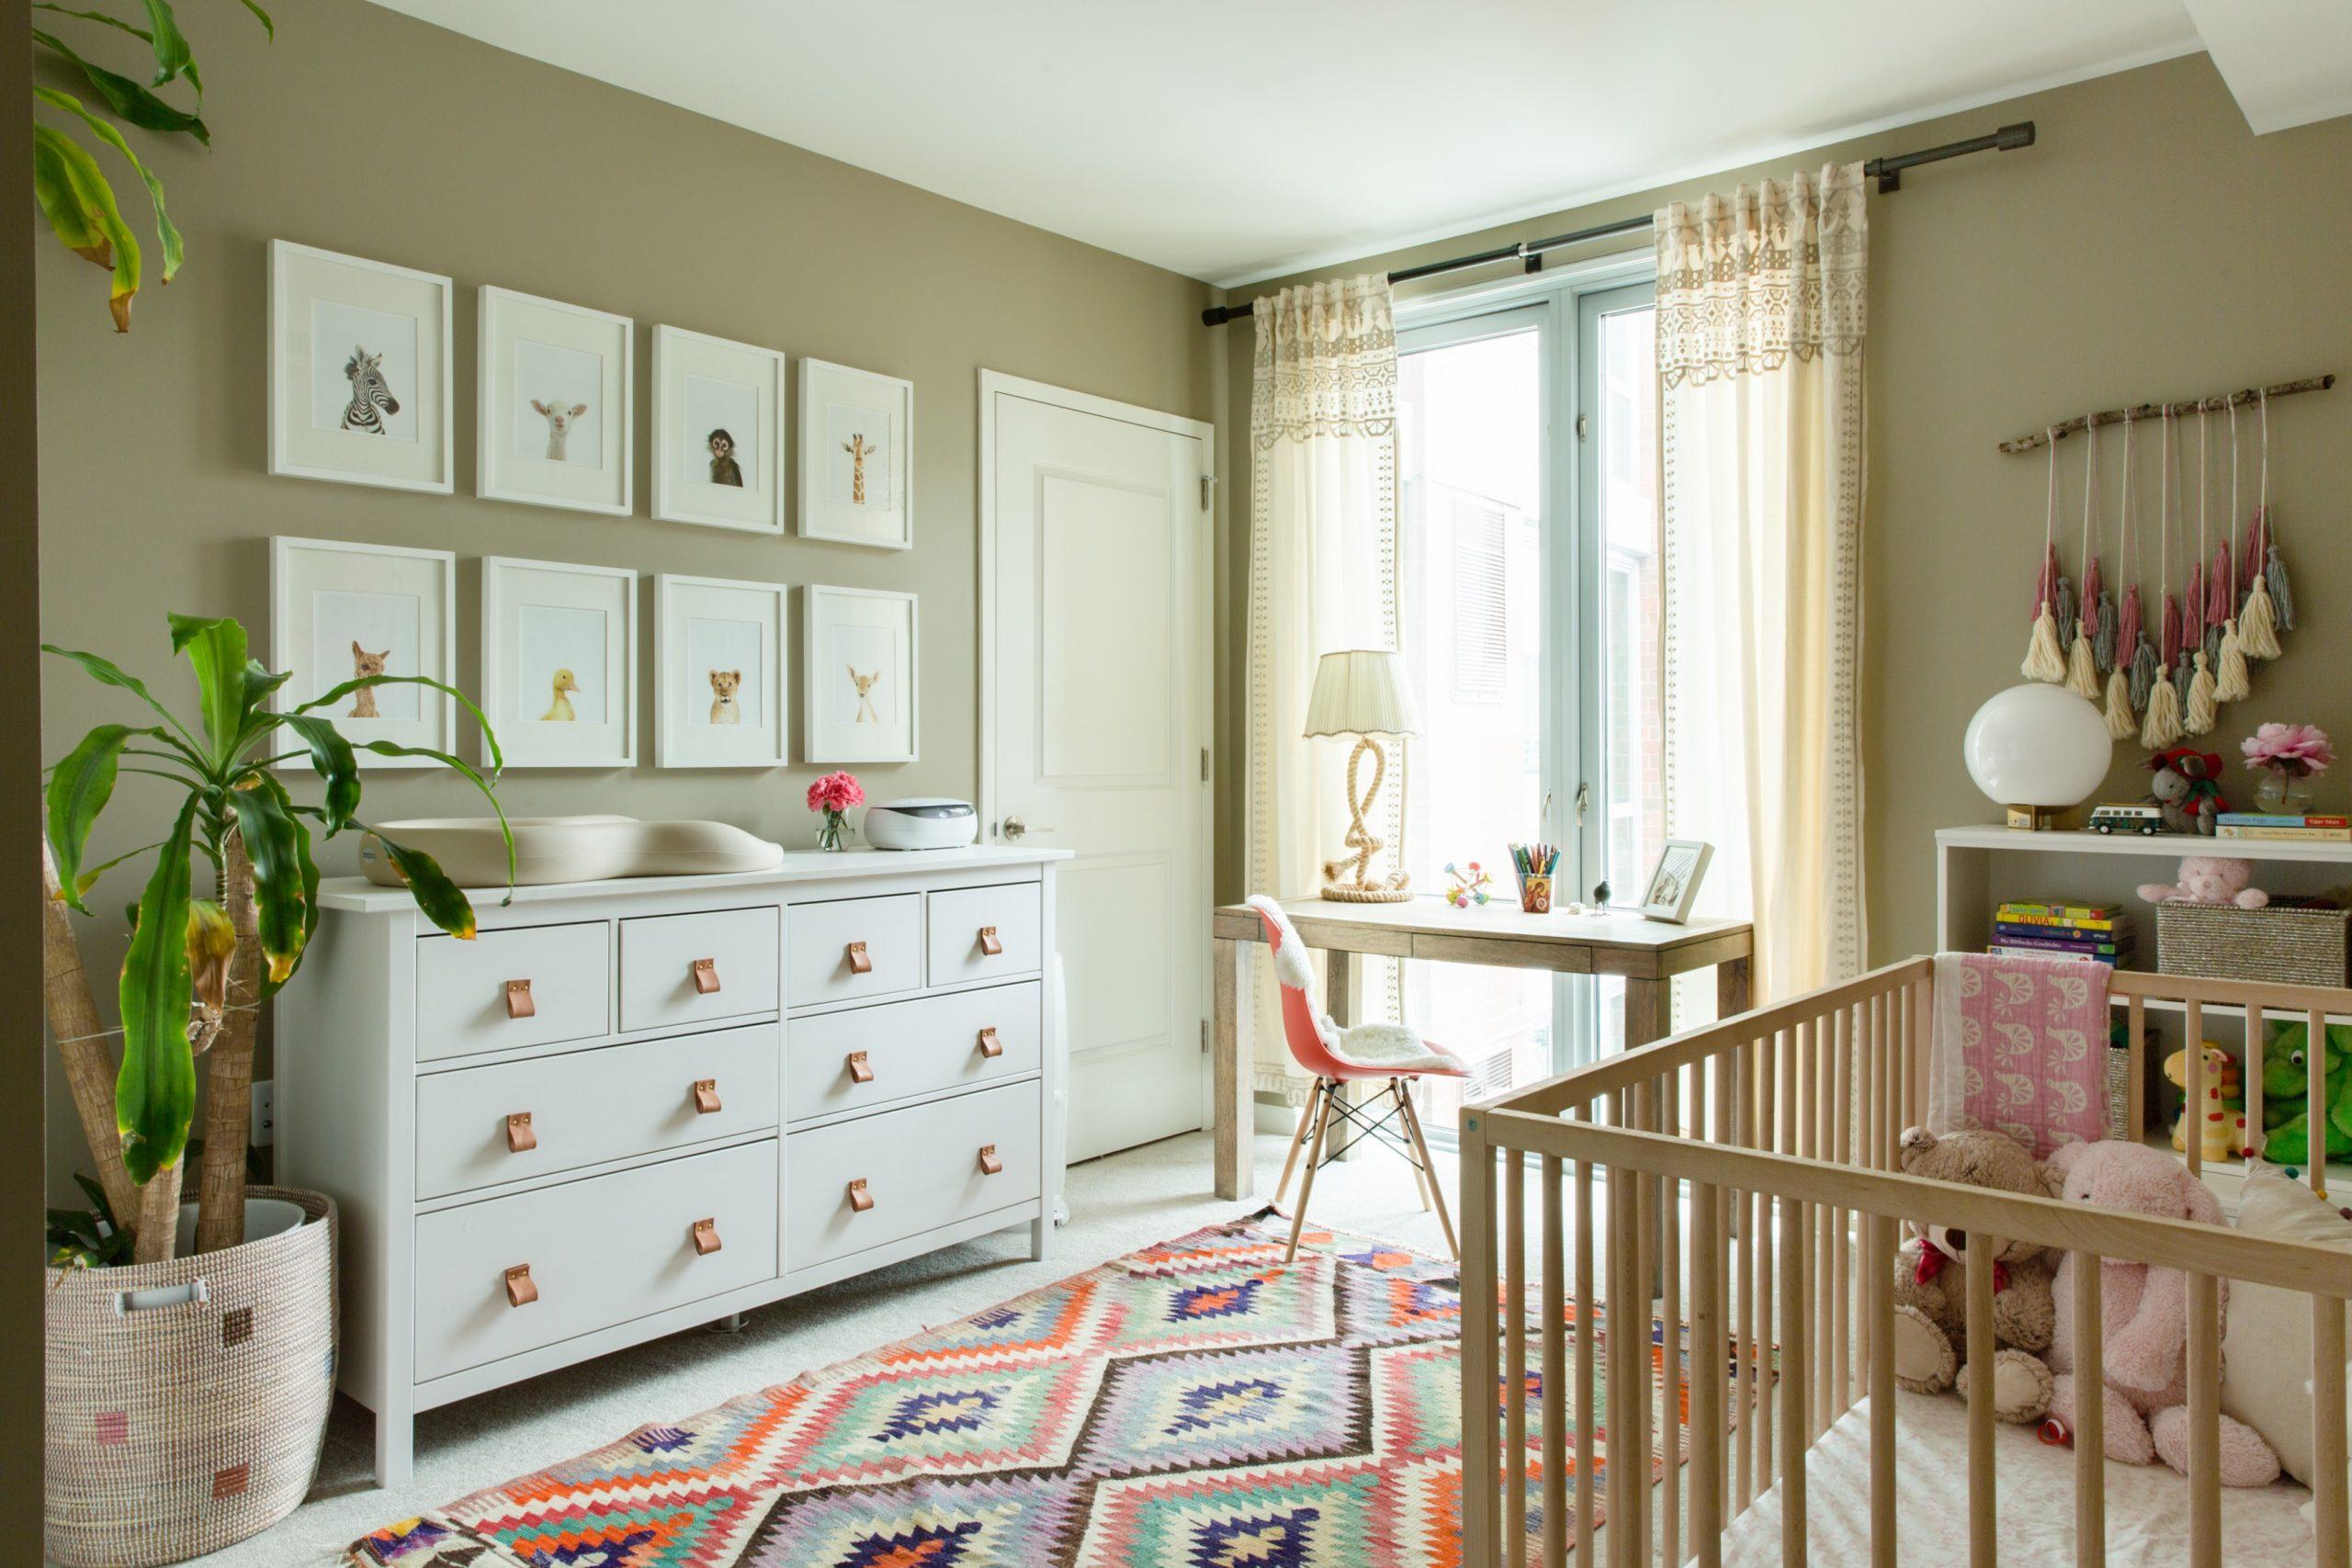 IKEA Hacks - Nursery Changing Tables, Gliders, Storage  Apartment  - Baby Room Ikea